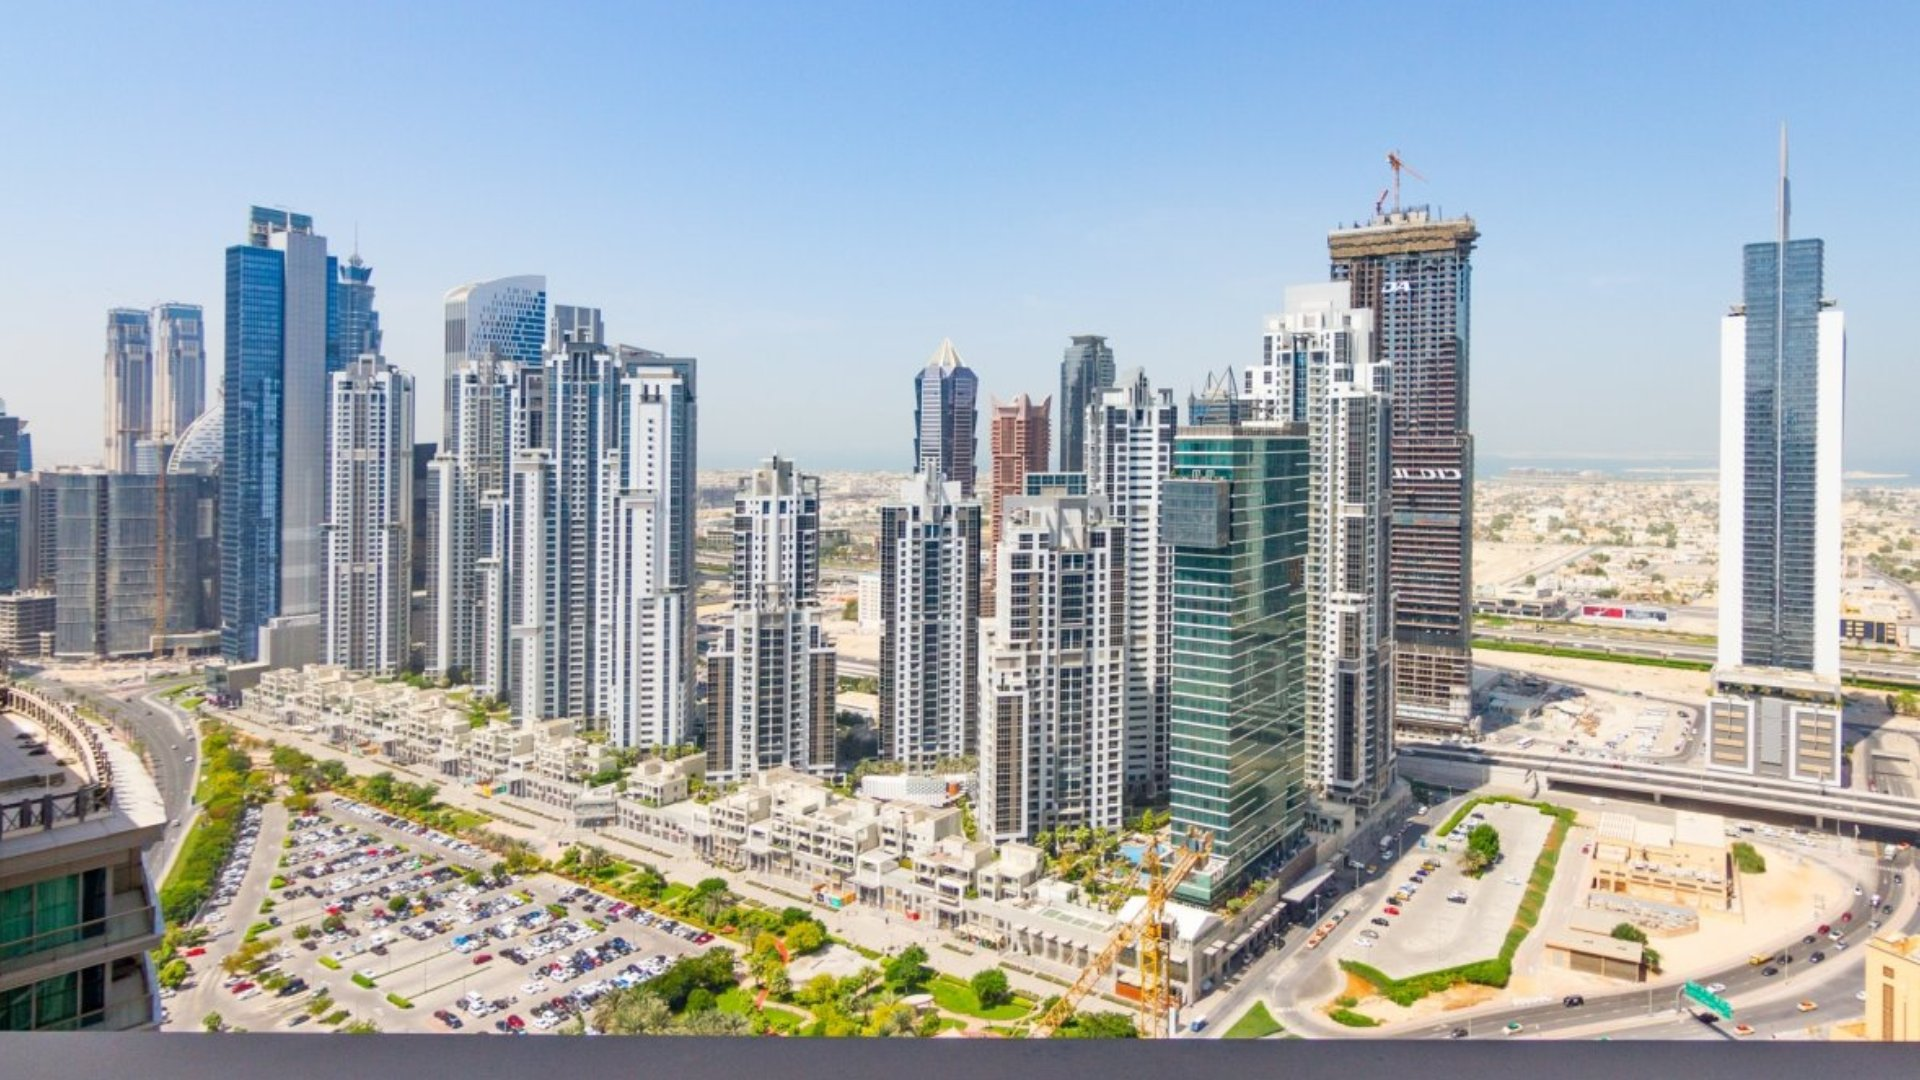 BLVD CRESCENT, Downtown Dubai, UAE – photo 6